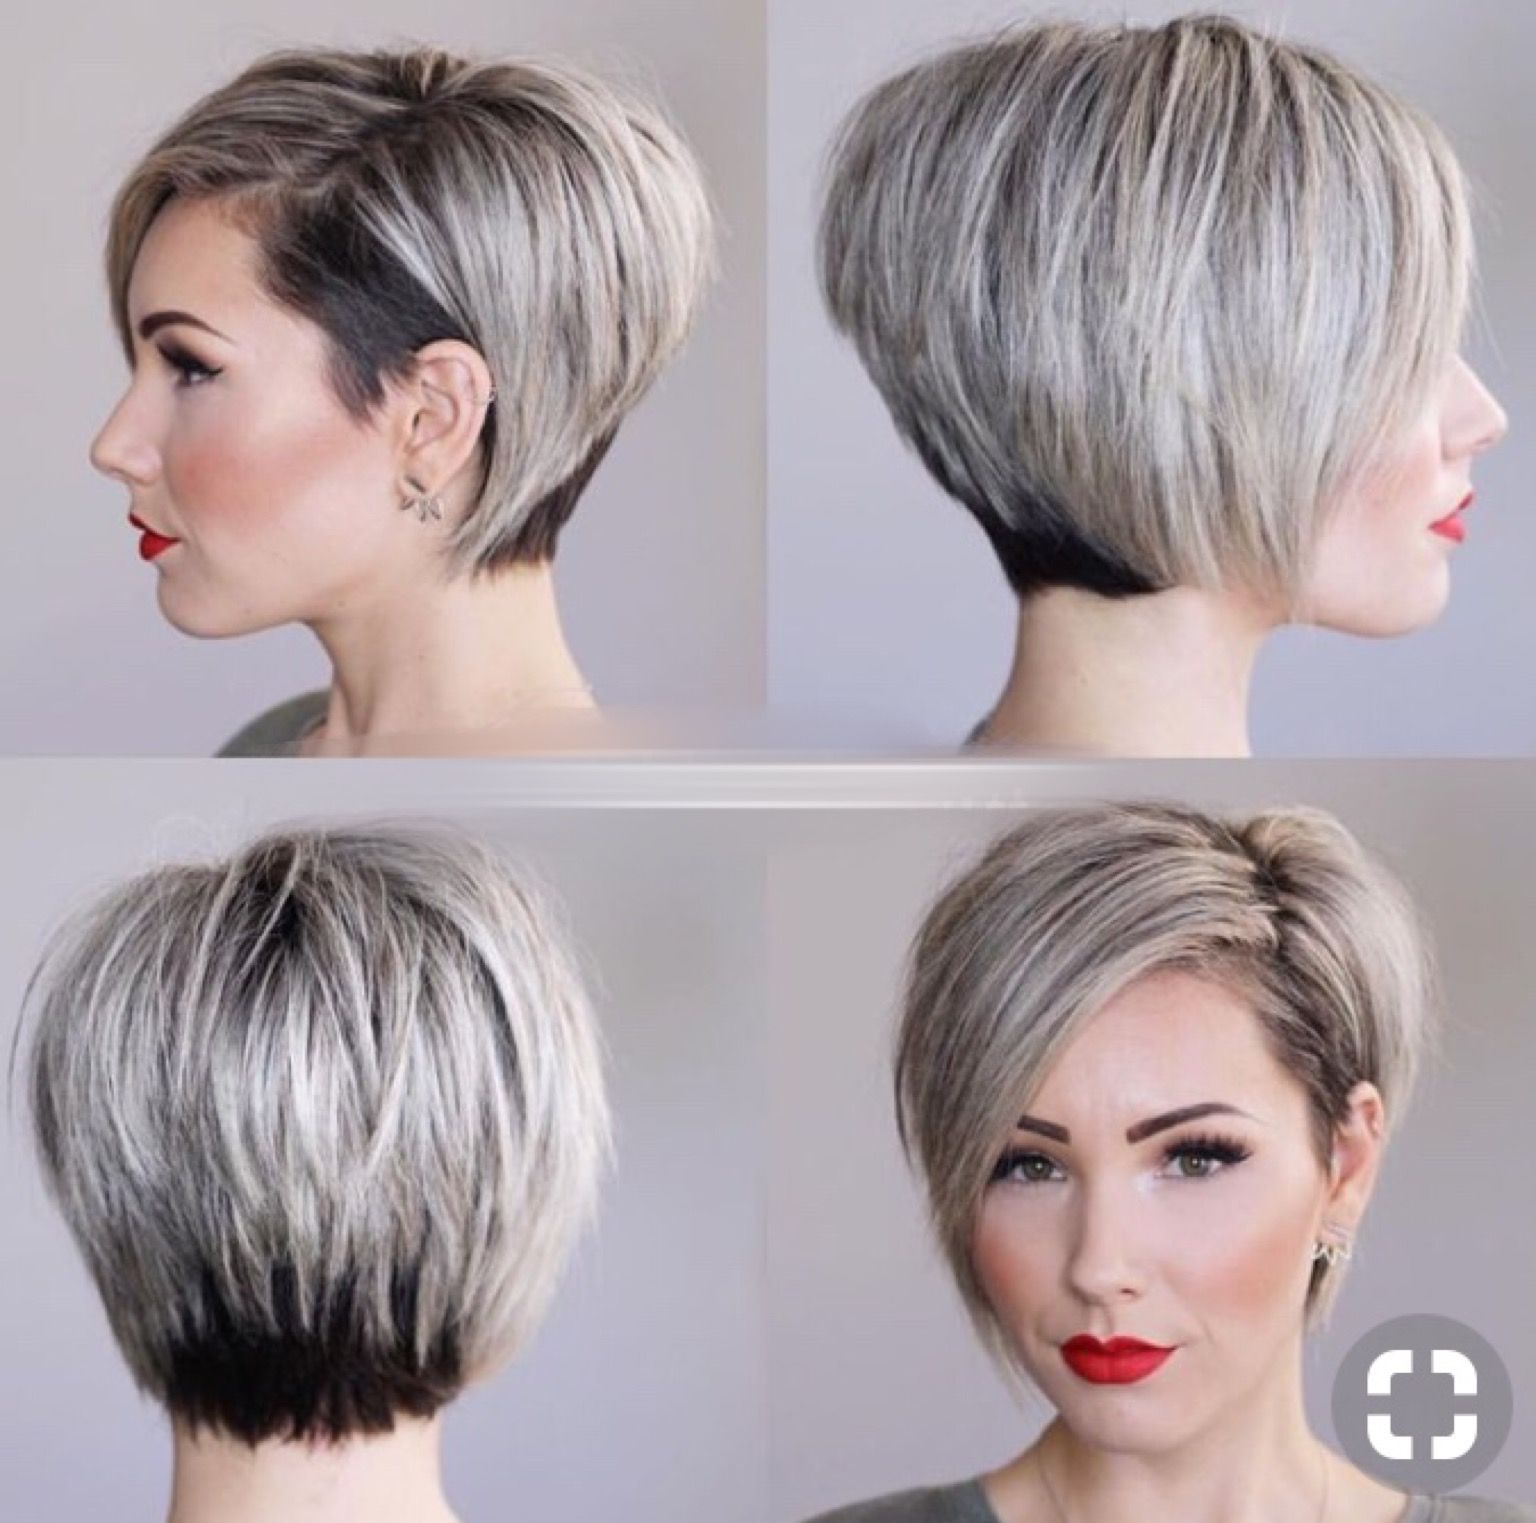 Pin By Mel Ram On Hair Short Hair Styles Easy Short Hair Styles